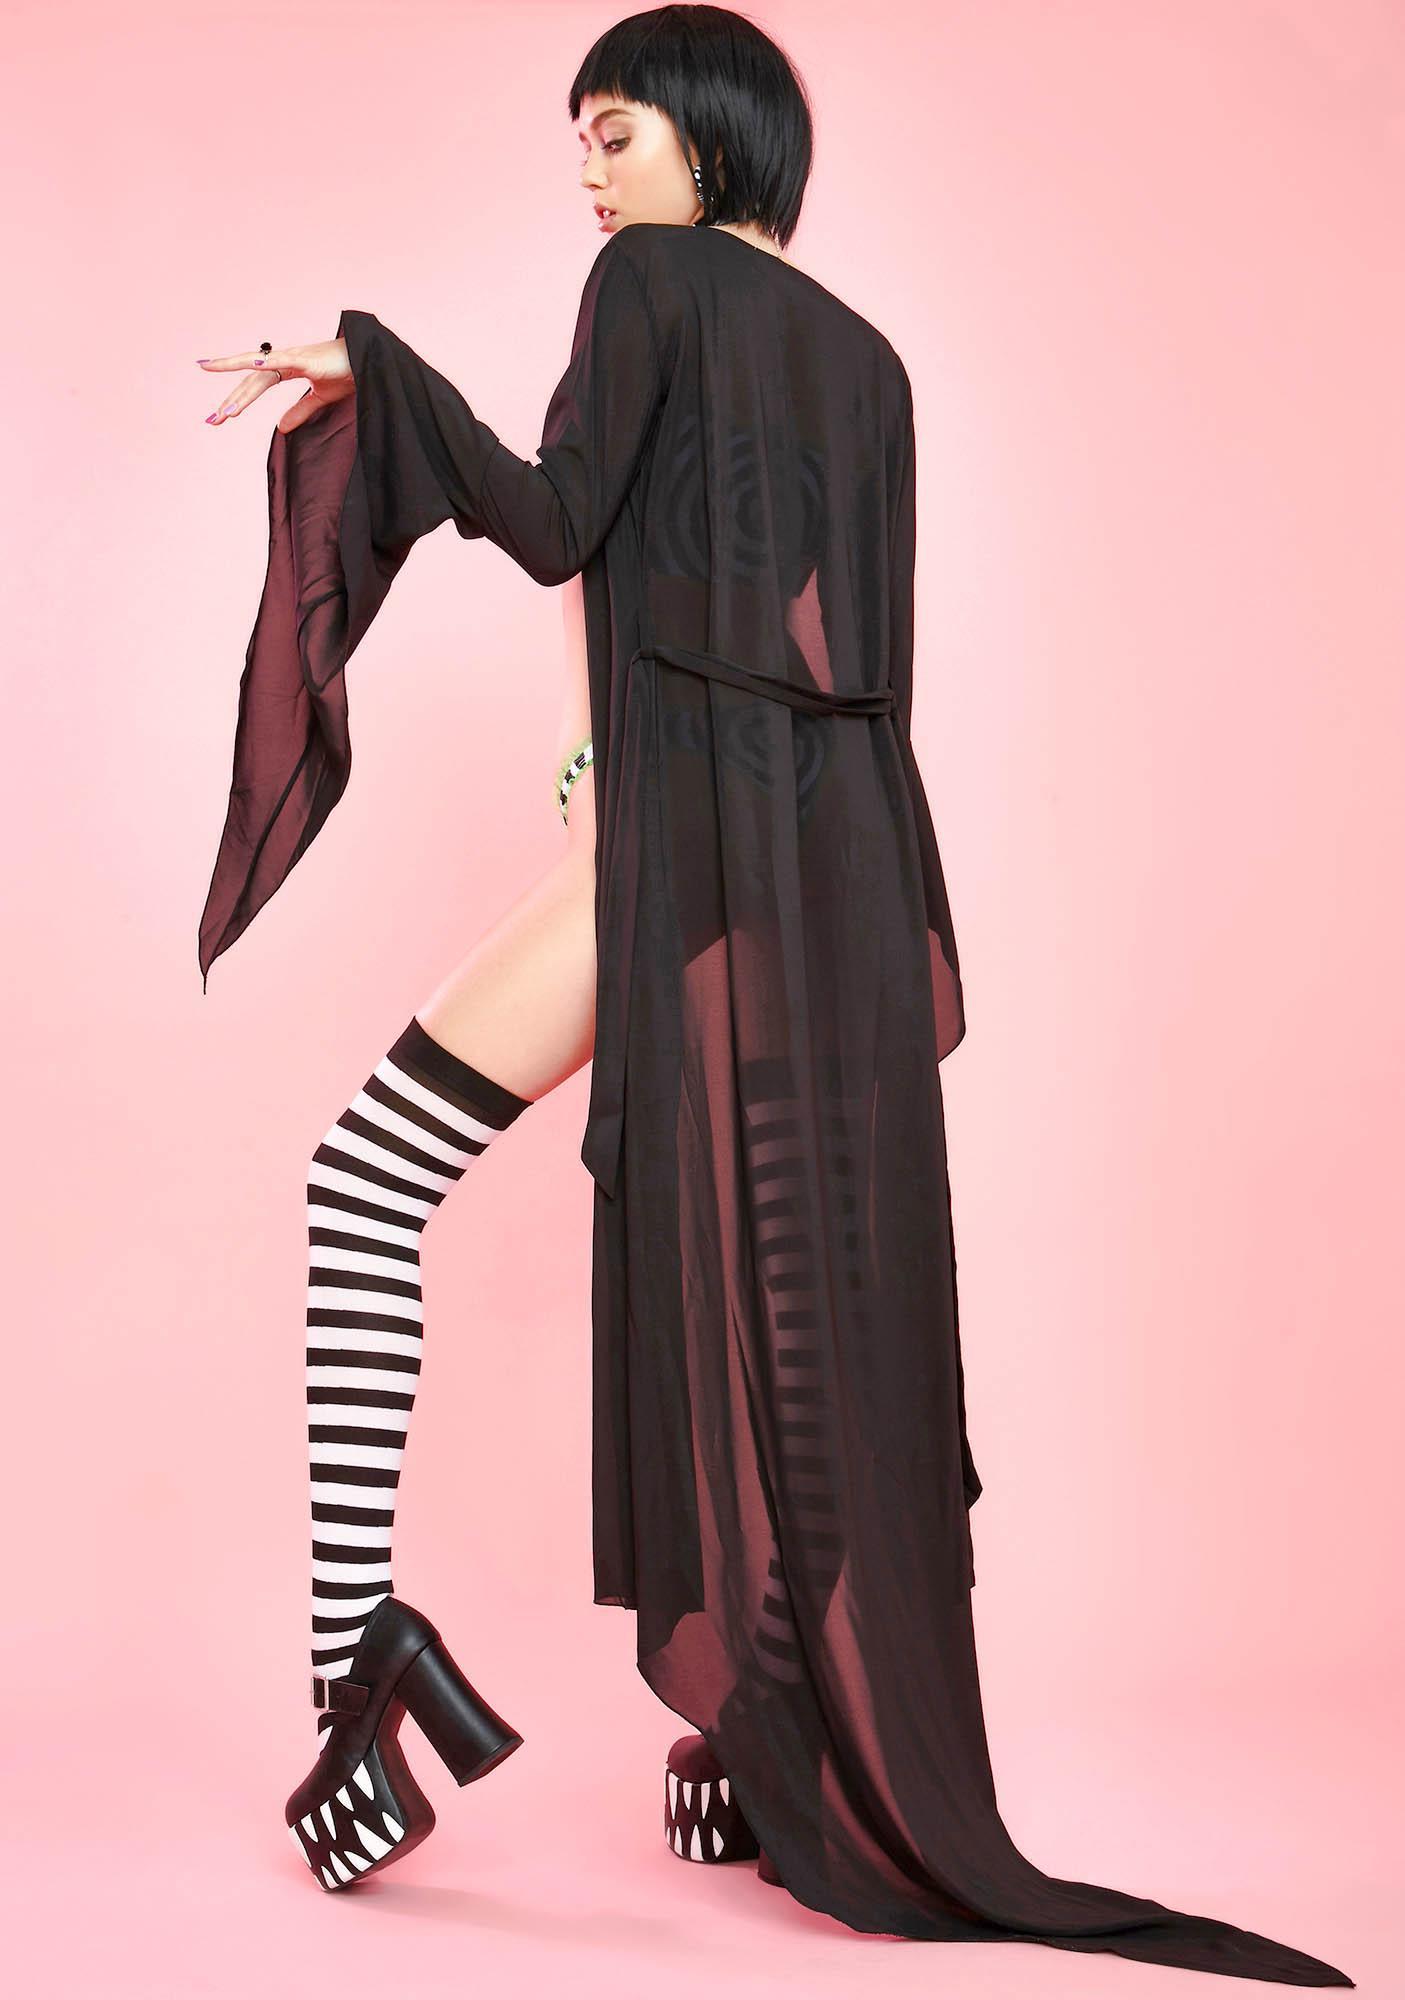 Sugar Thrillz Blissful Darkness Sheer Robe